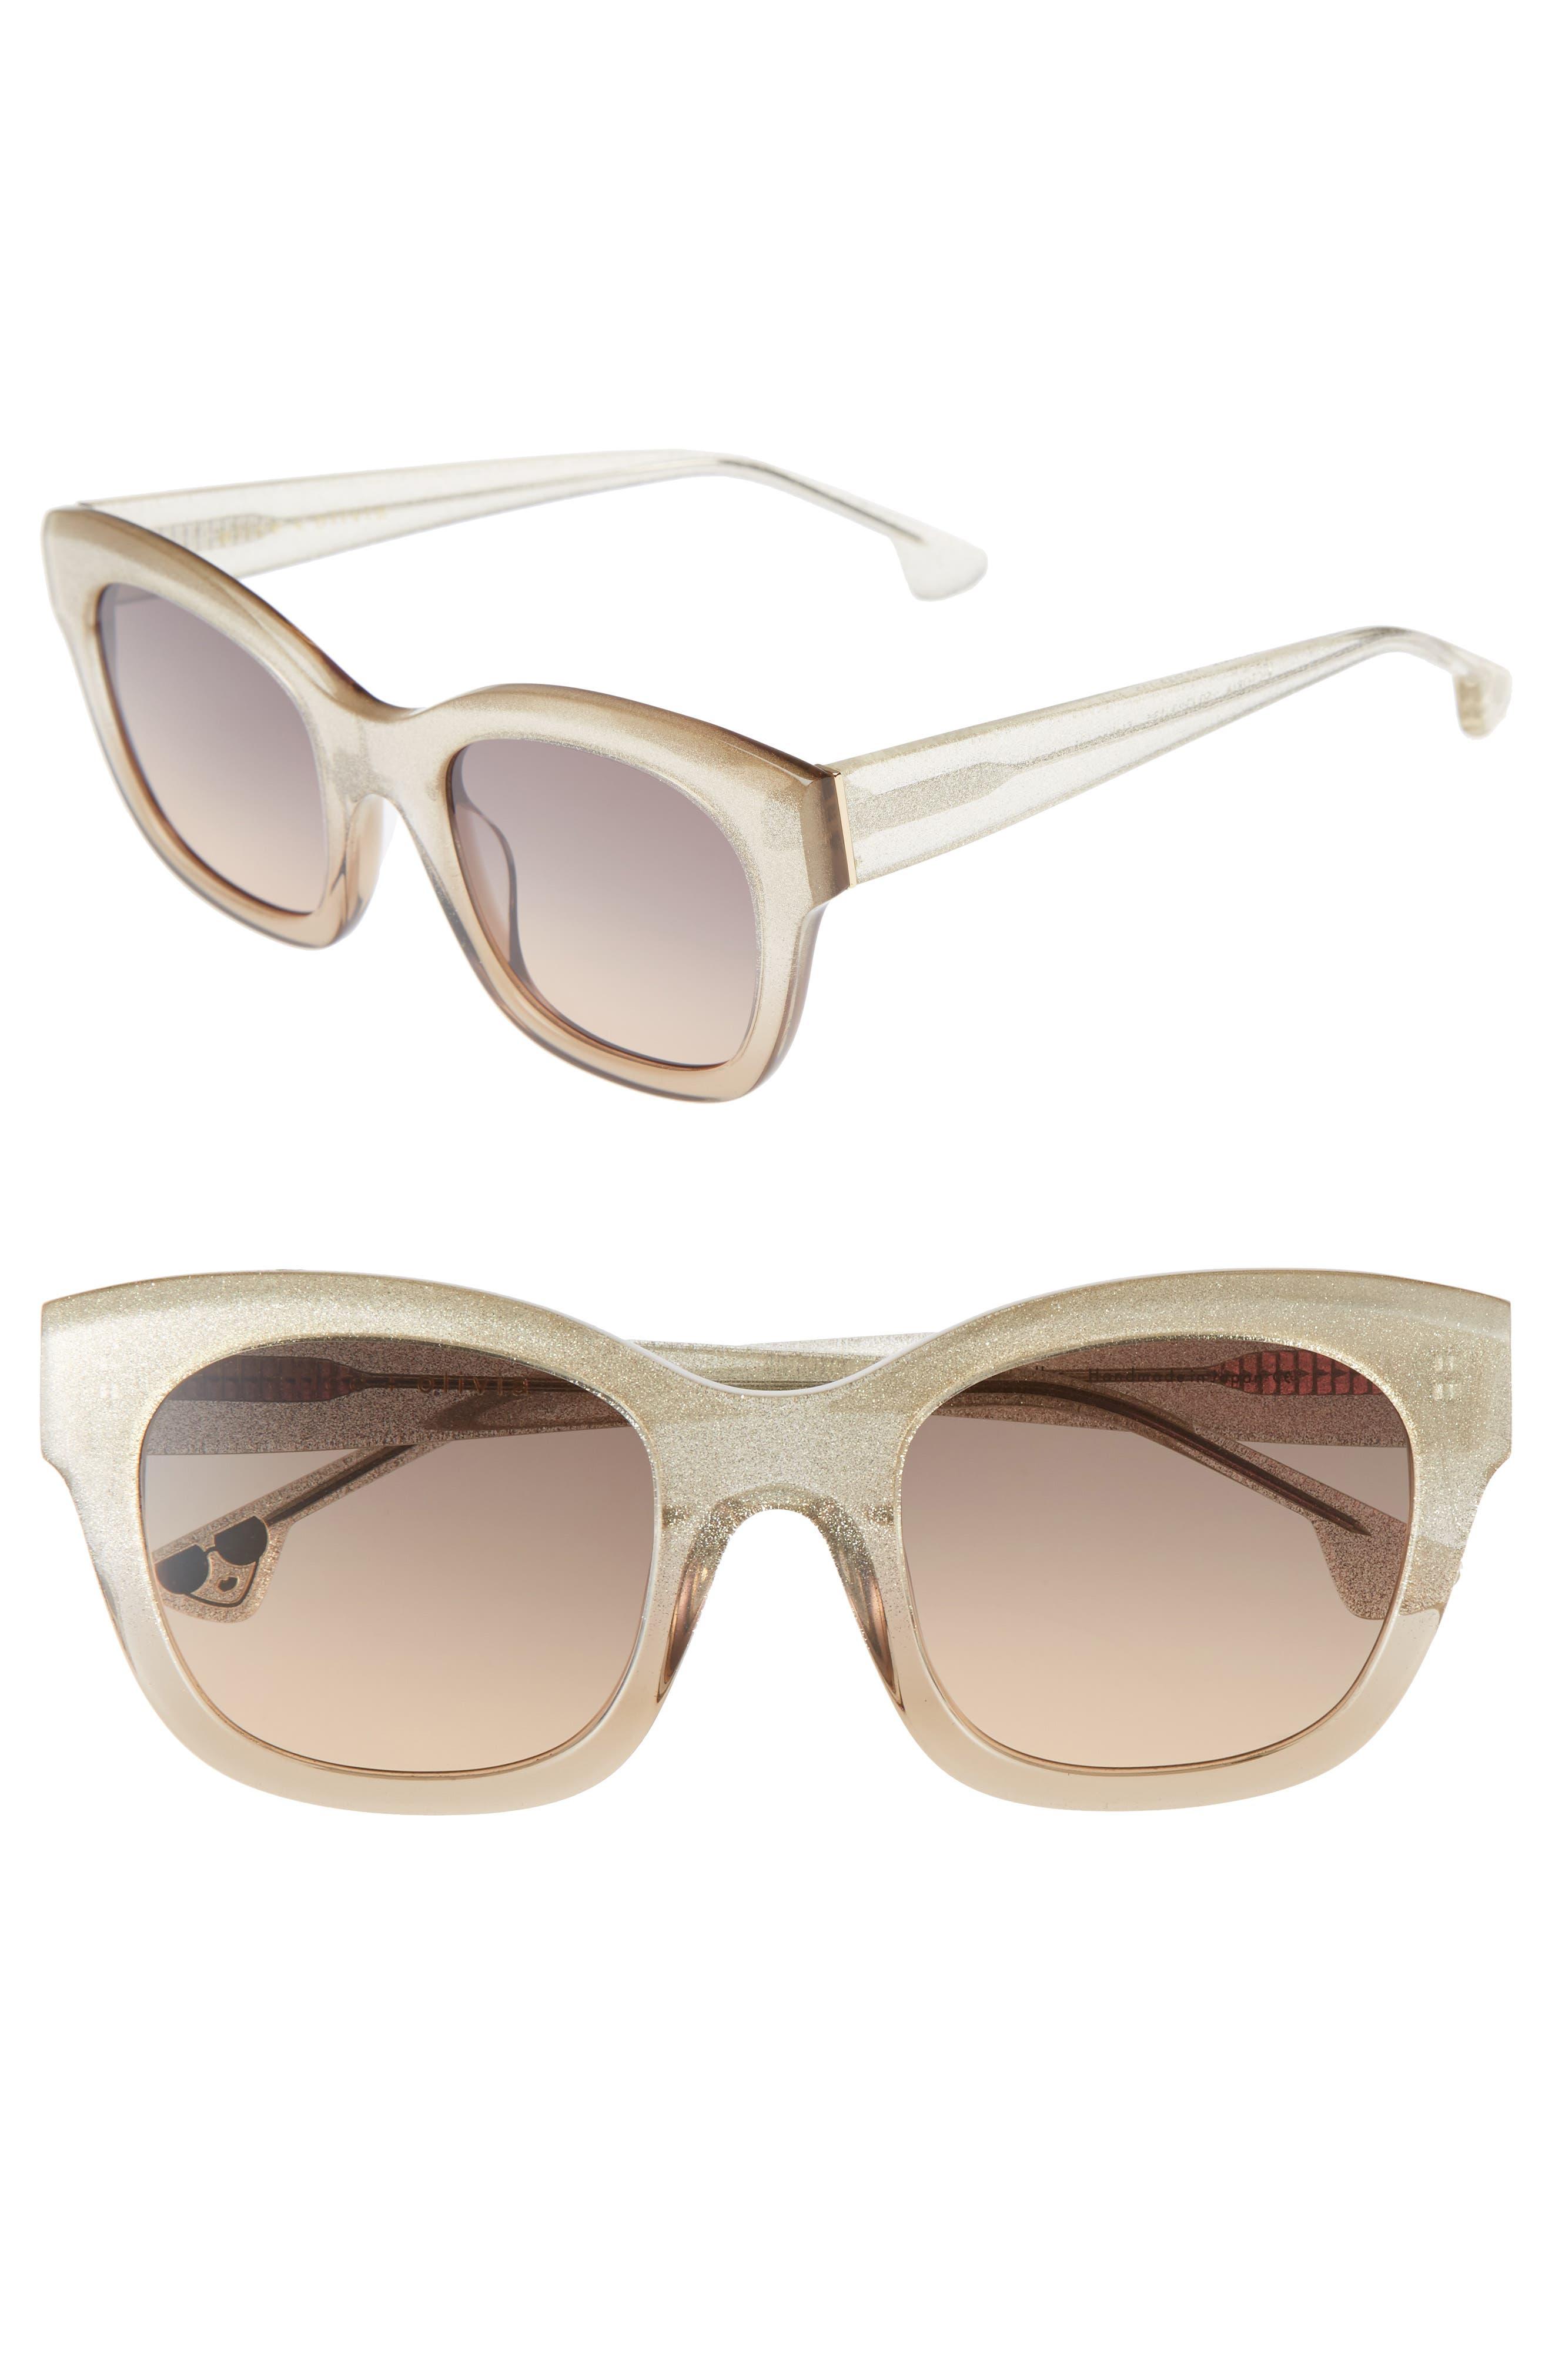 Victoria 50mm Cat Eye Sunglasses,                             Main thumbnail 1, color,                             001